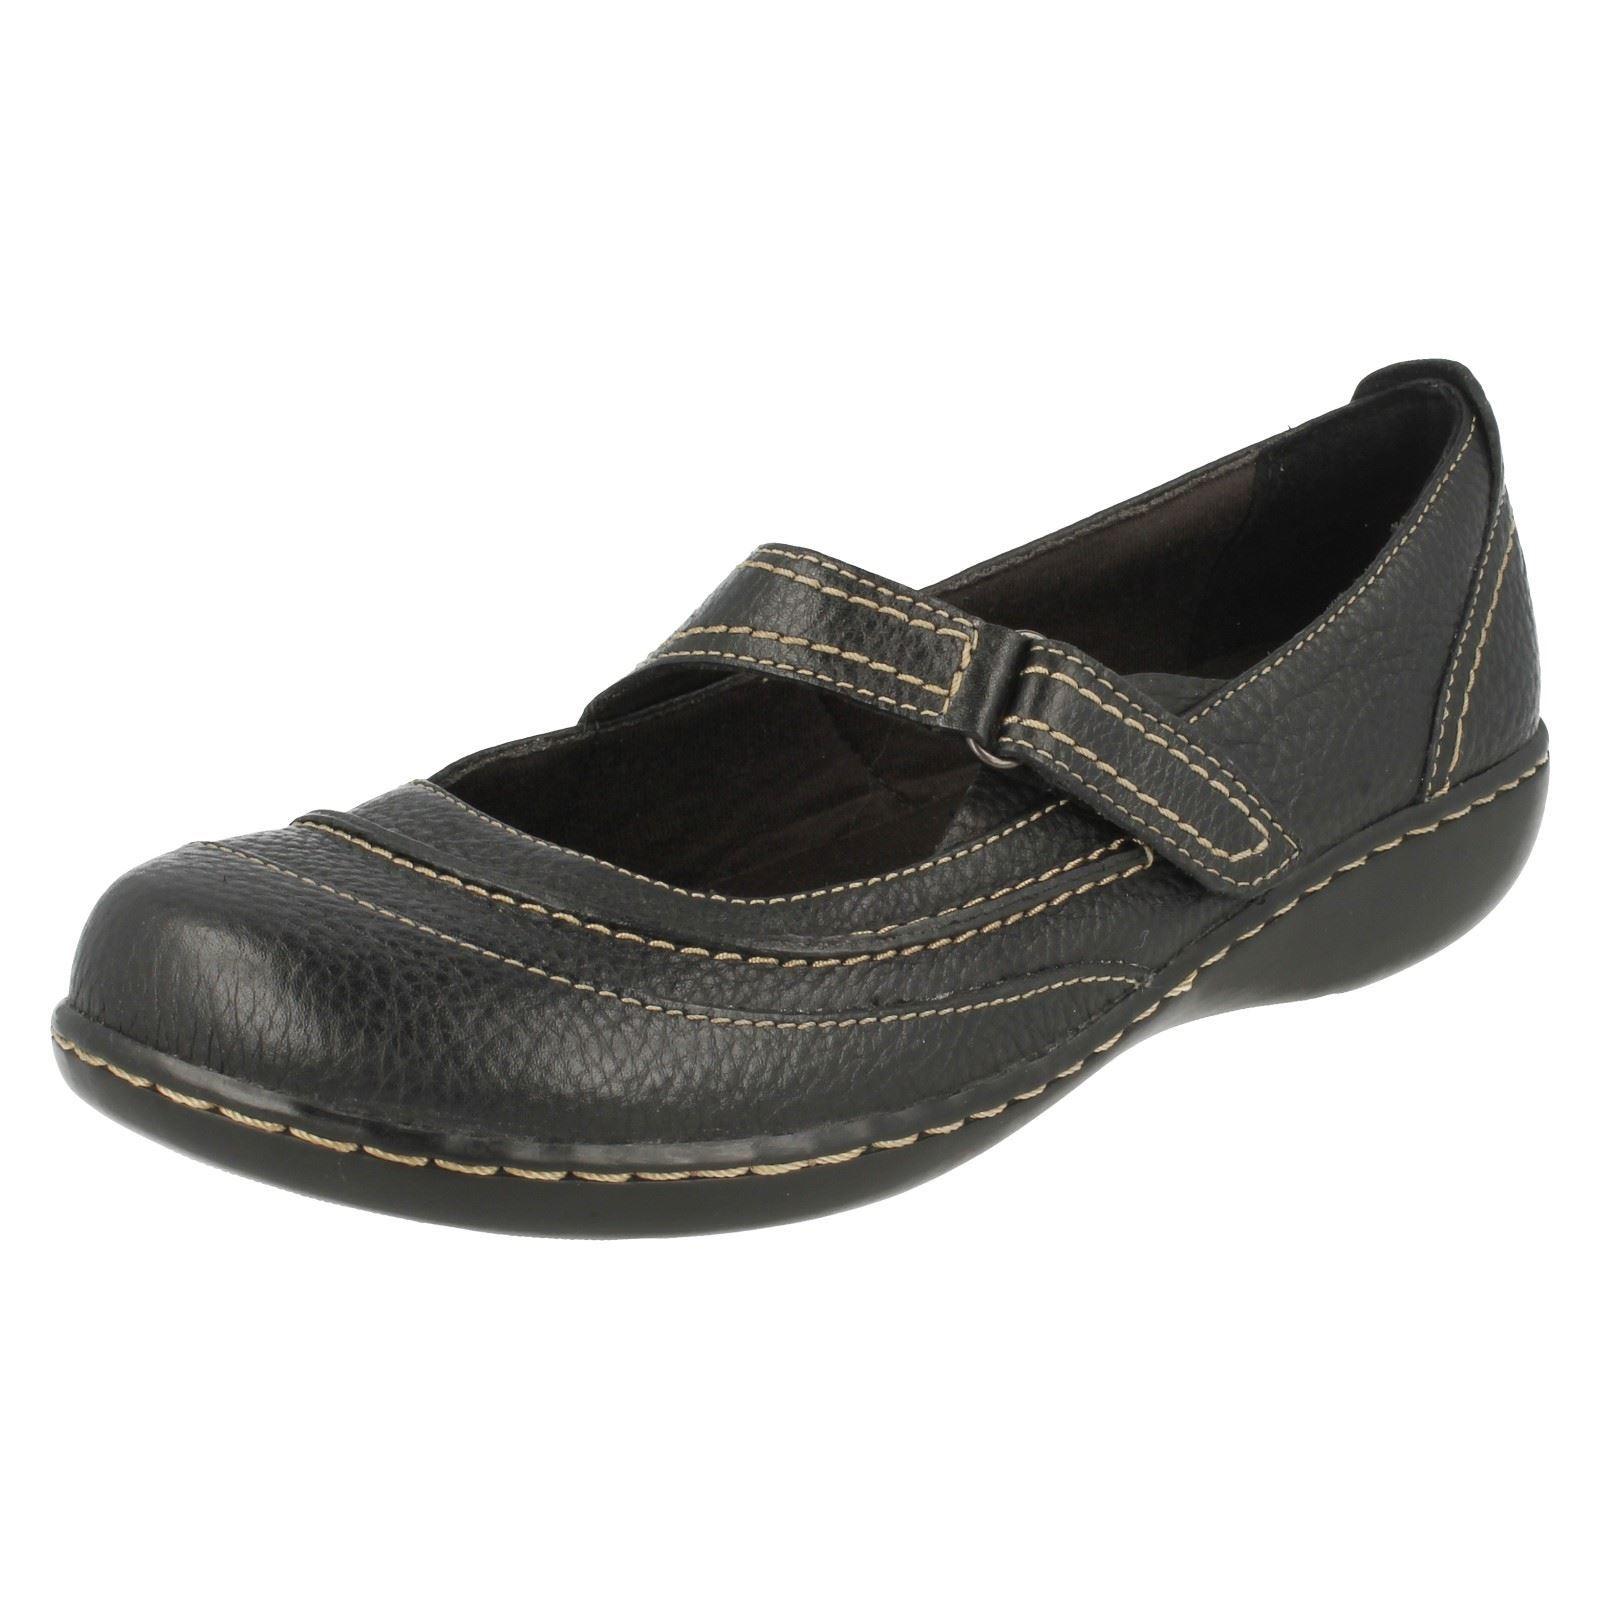 Embrace De Mujer Zapatos Clarks Detalles Diario Chat BWdCxore